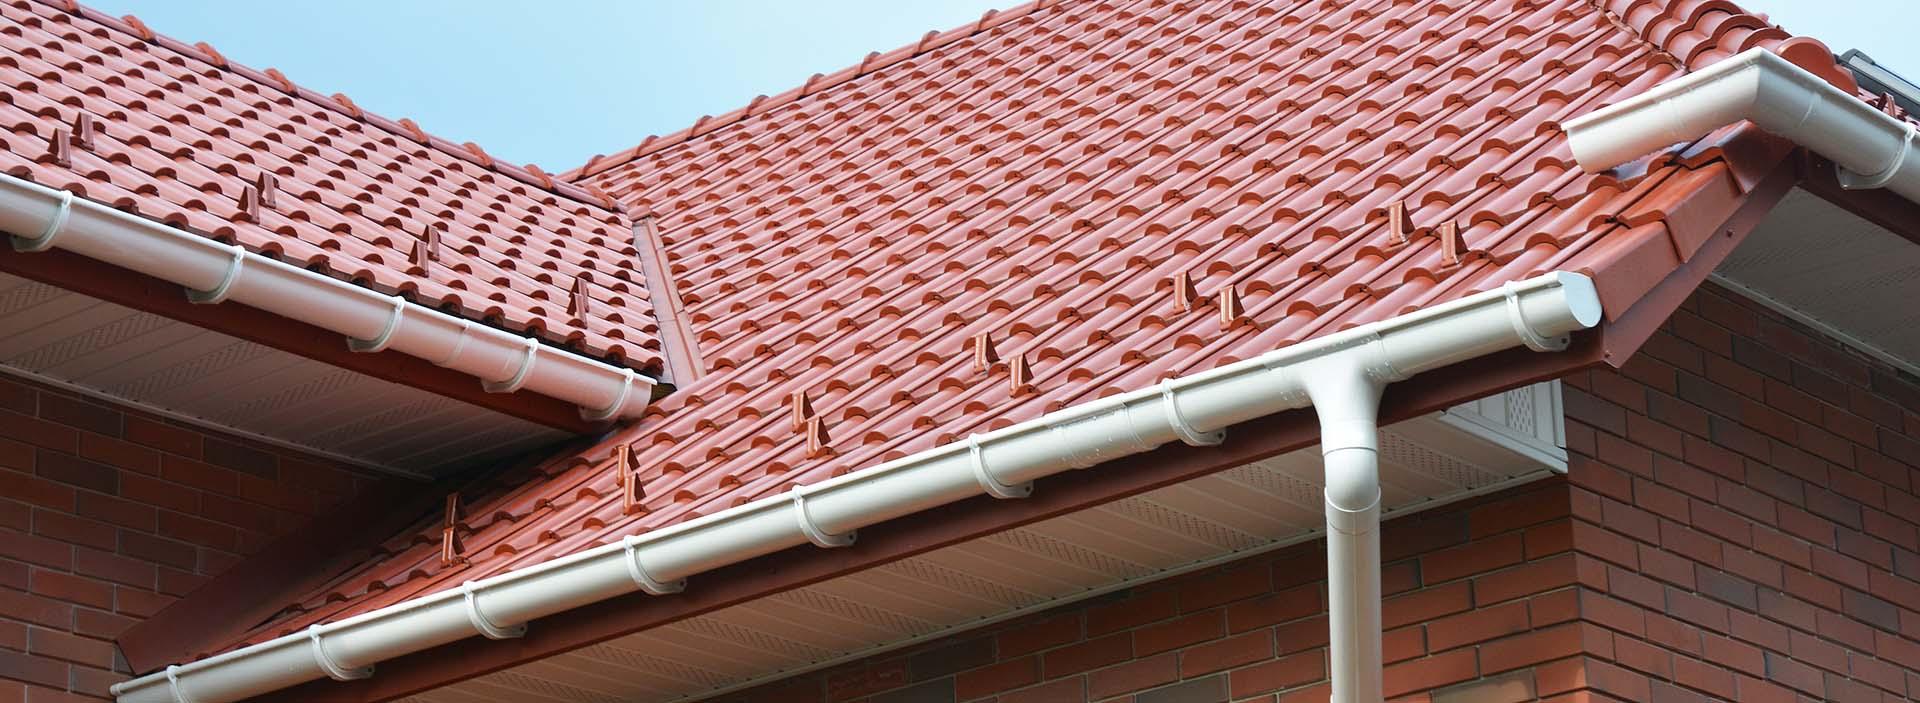 Brisbane Colorbond roofing